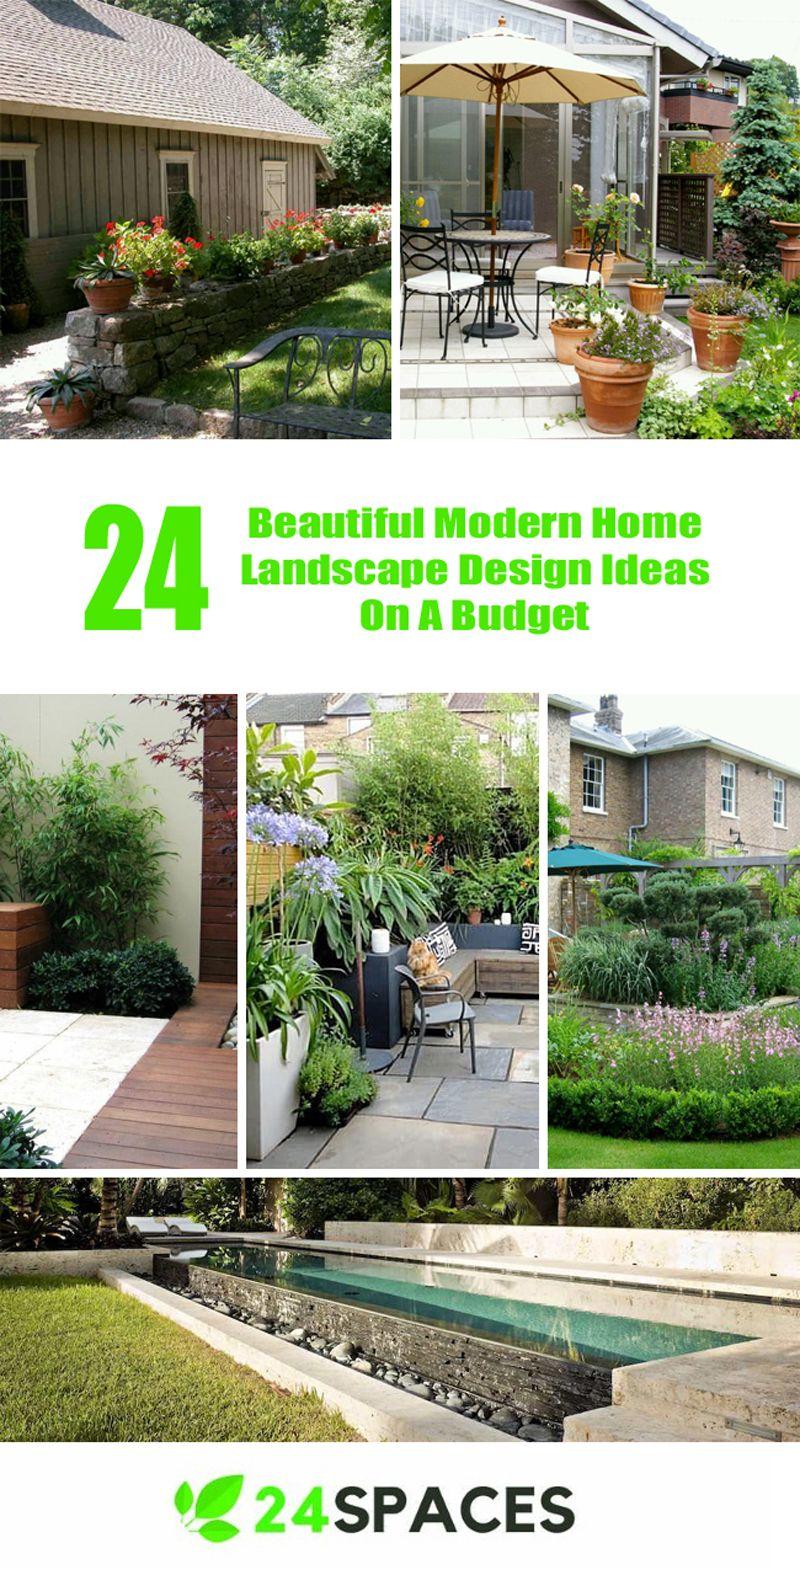 Landscape of house garden   Beautiful Modern Home Landscape Design Ideas On A Budget